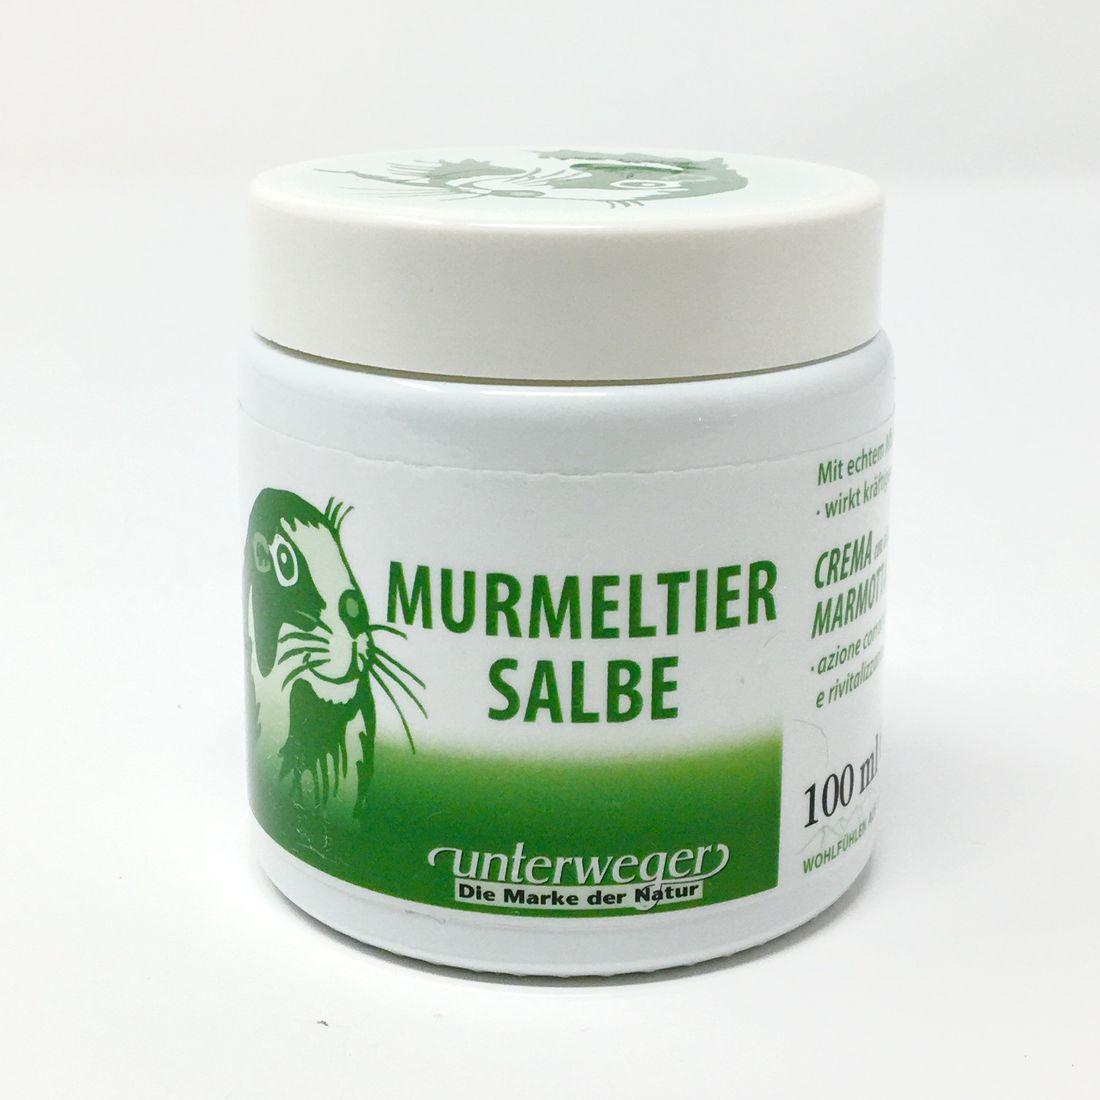 Unterweger Murmeltier Salbe 100ml